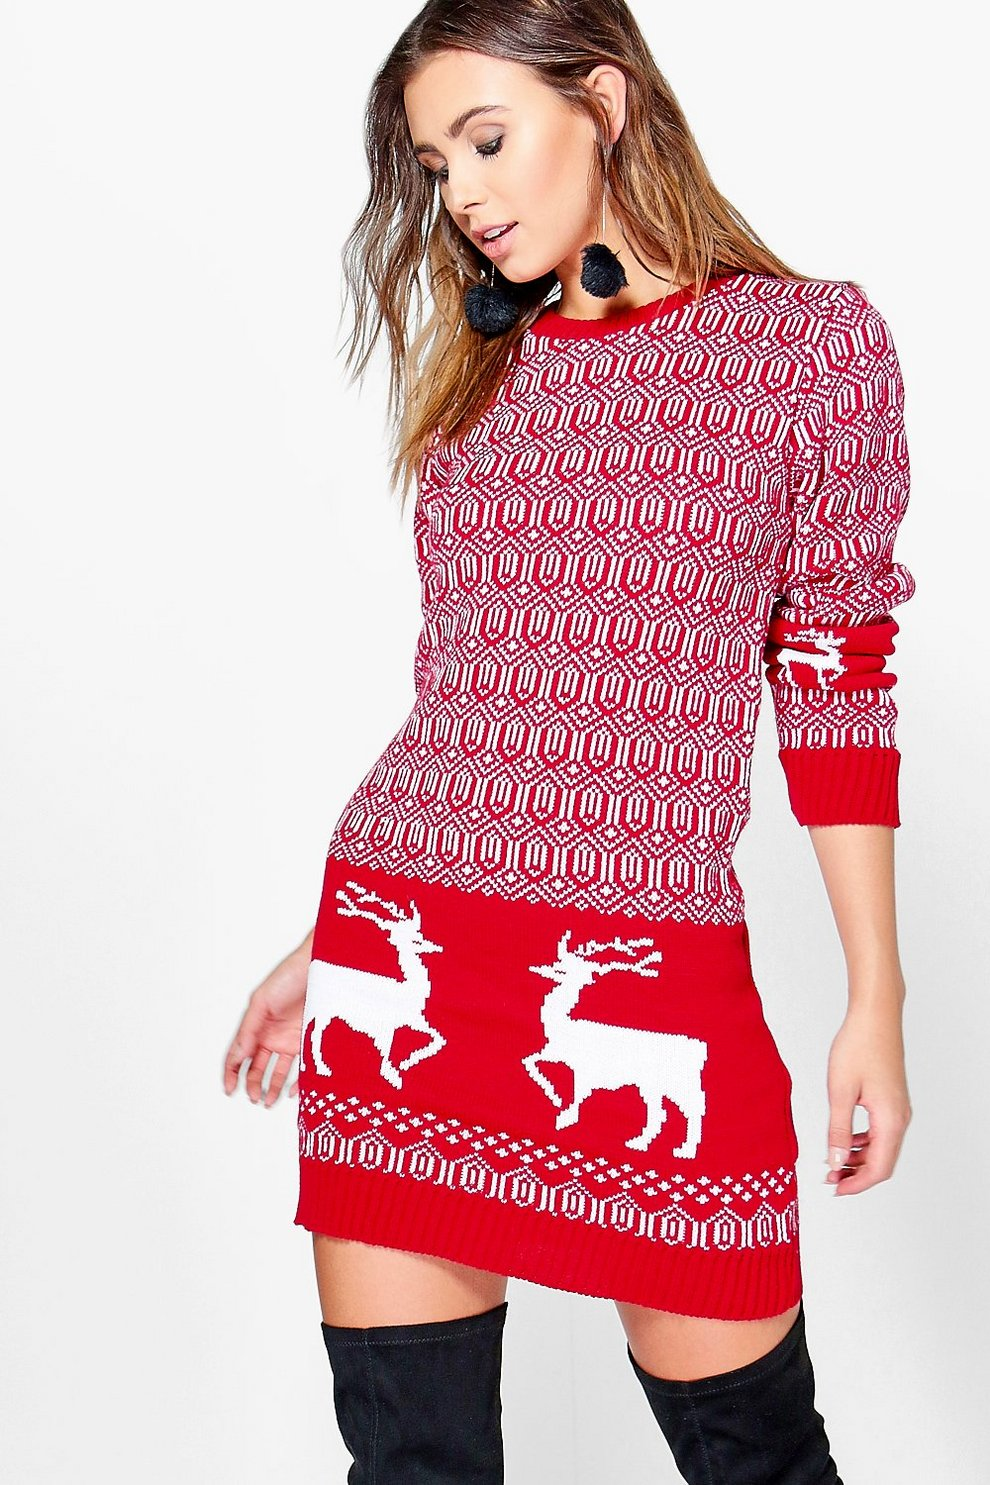 b2b5b2c6f661 Womens Red Petite Lara Reindeer Christmas Knit Dress